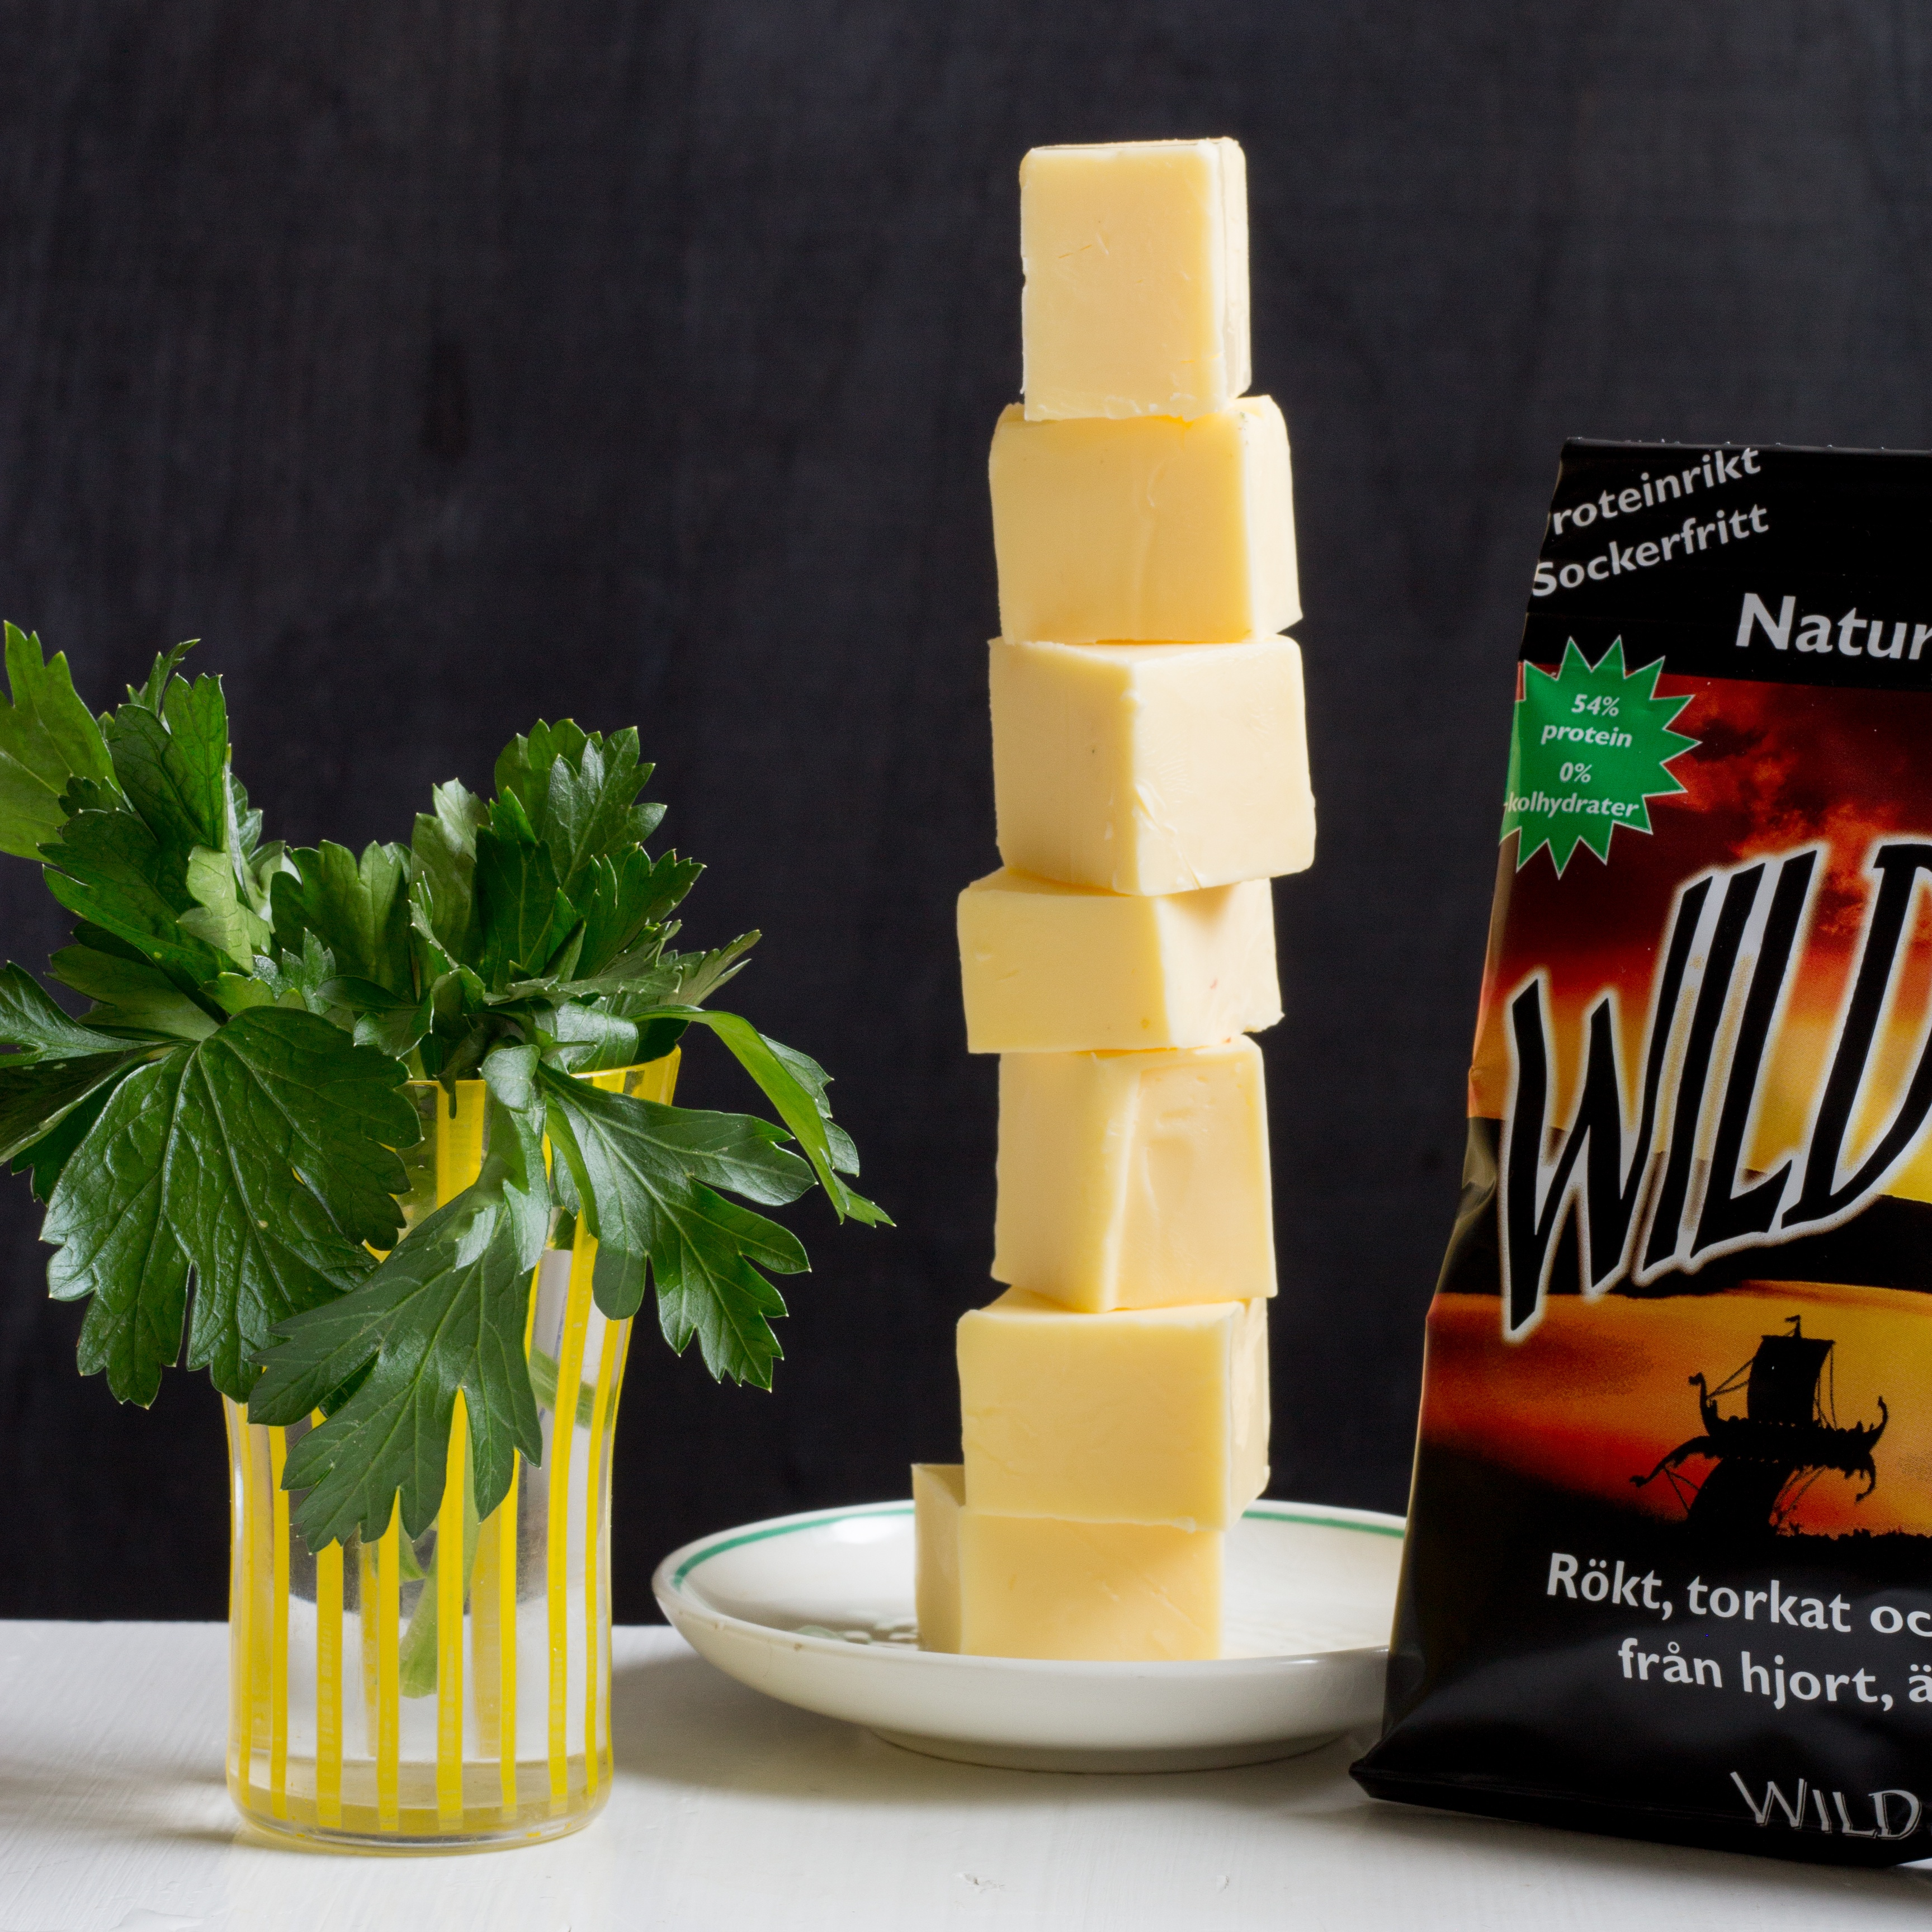 Wild Chips smör 3